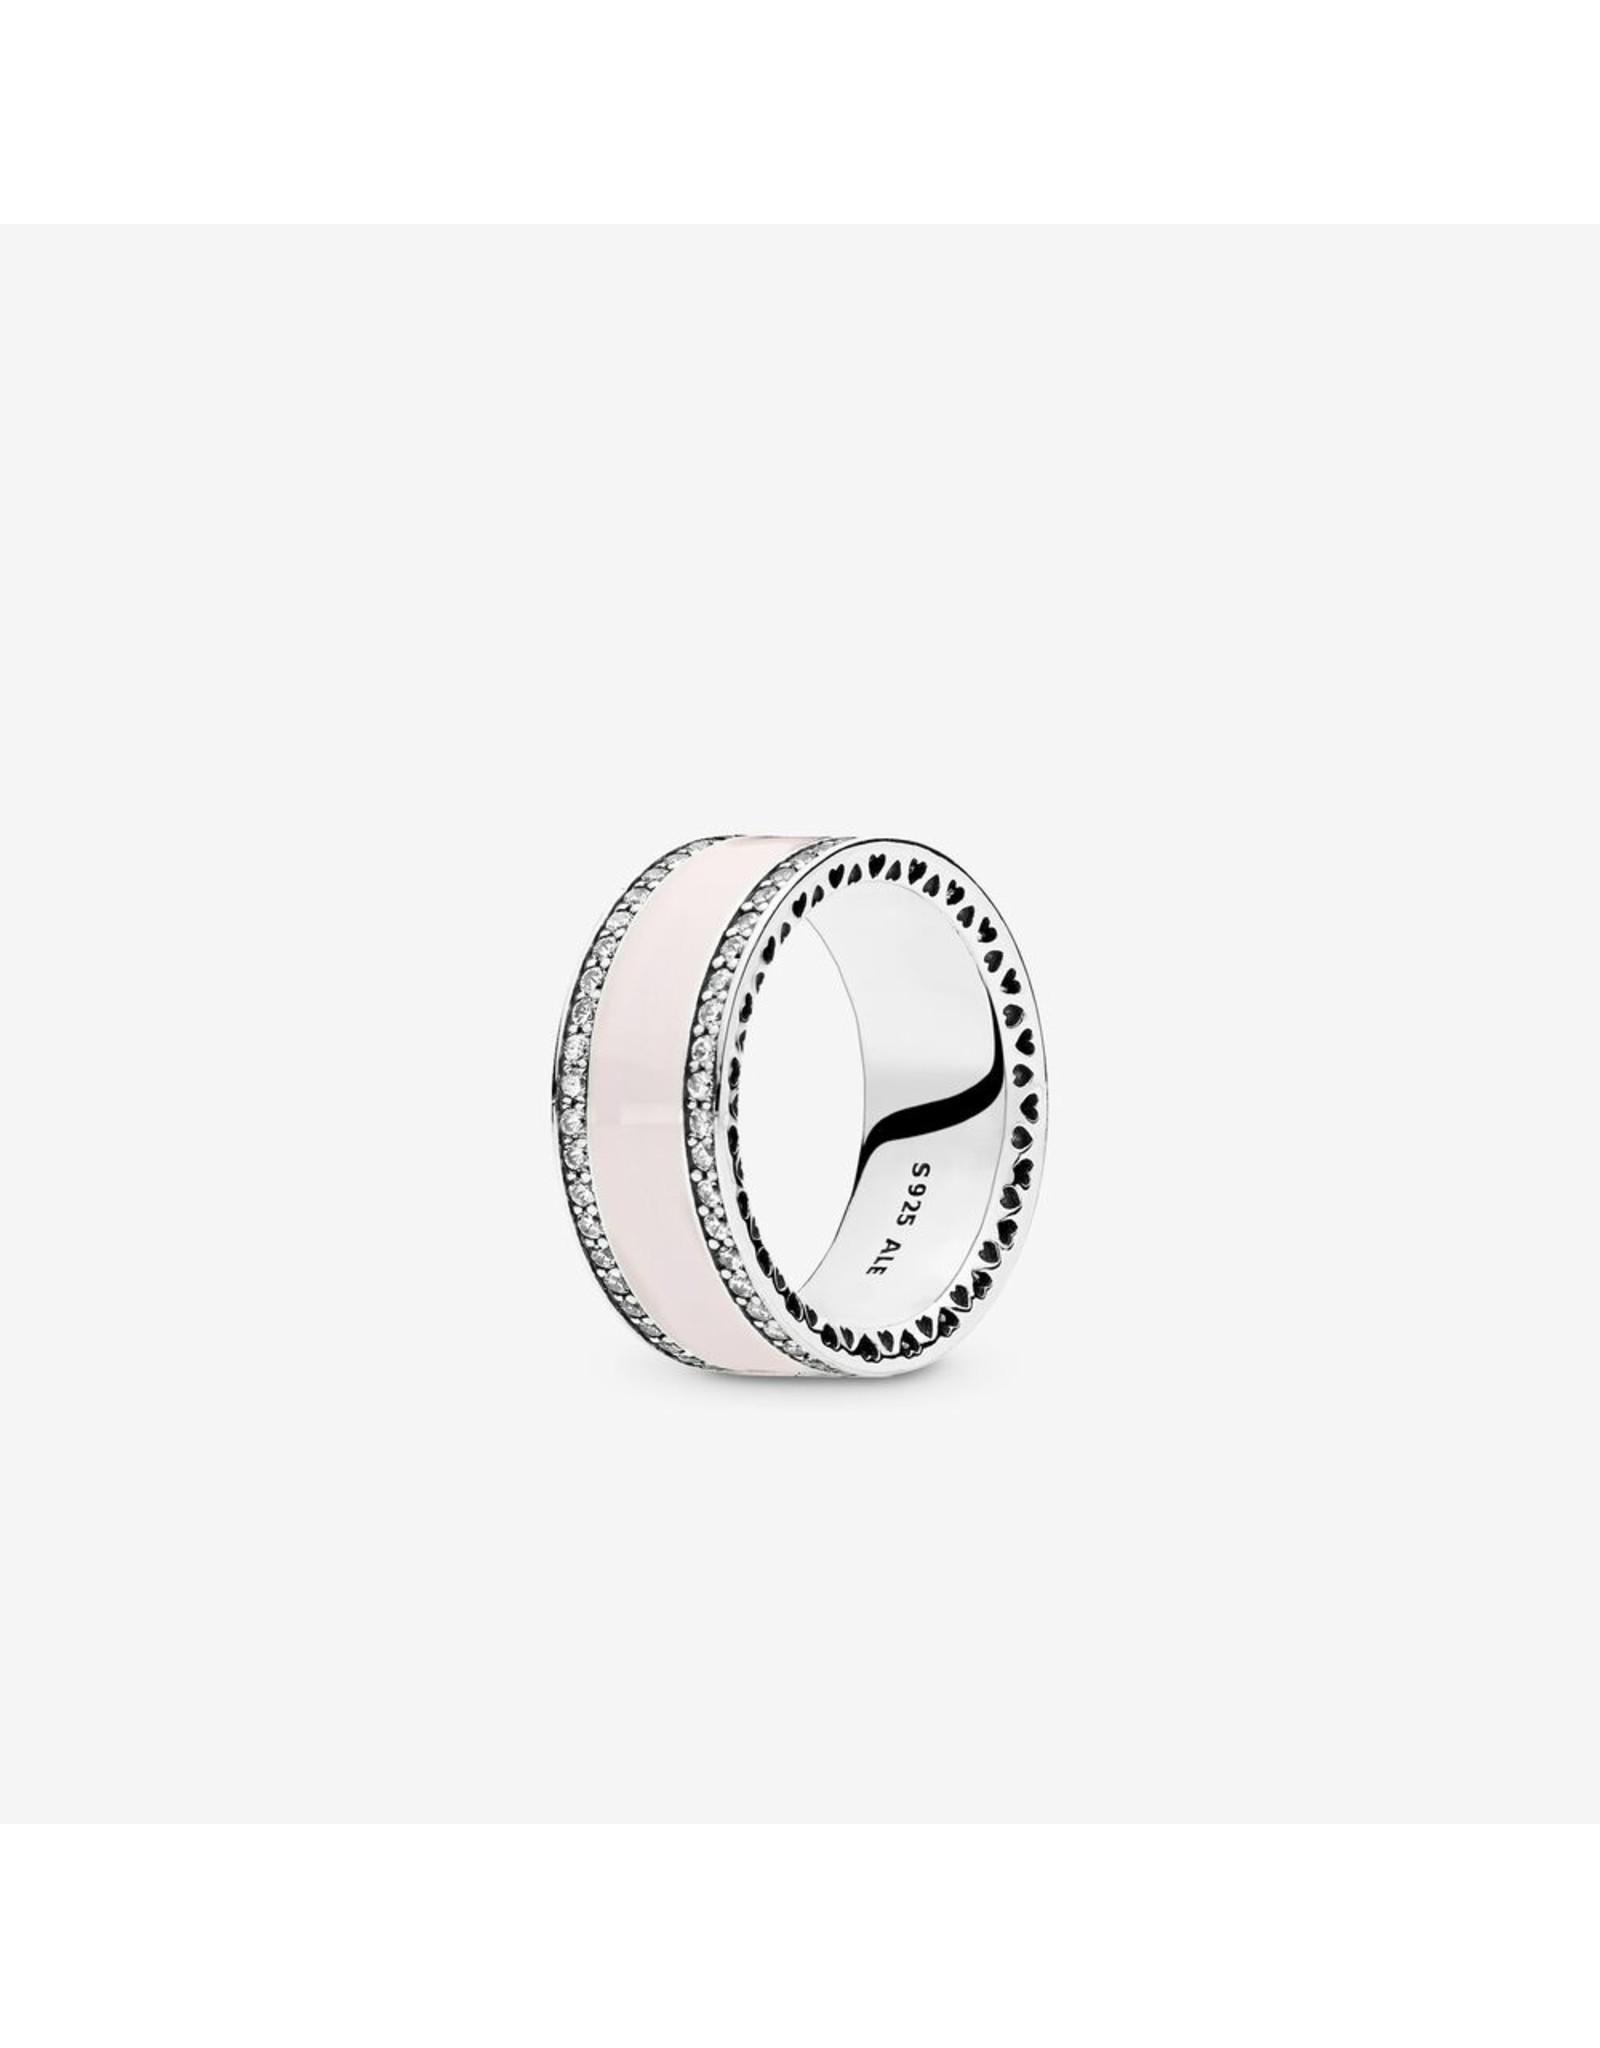 Pandora Pandora Ring, Hearts of Pandora, Soft Pink Enamel & Clear CZ